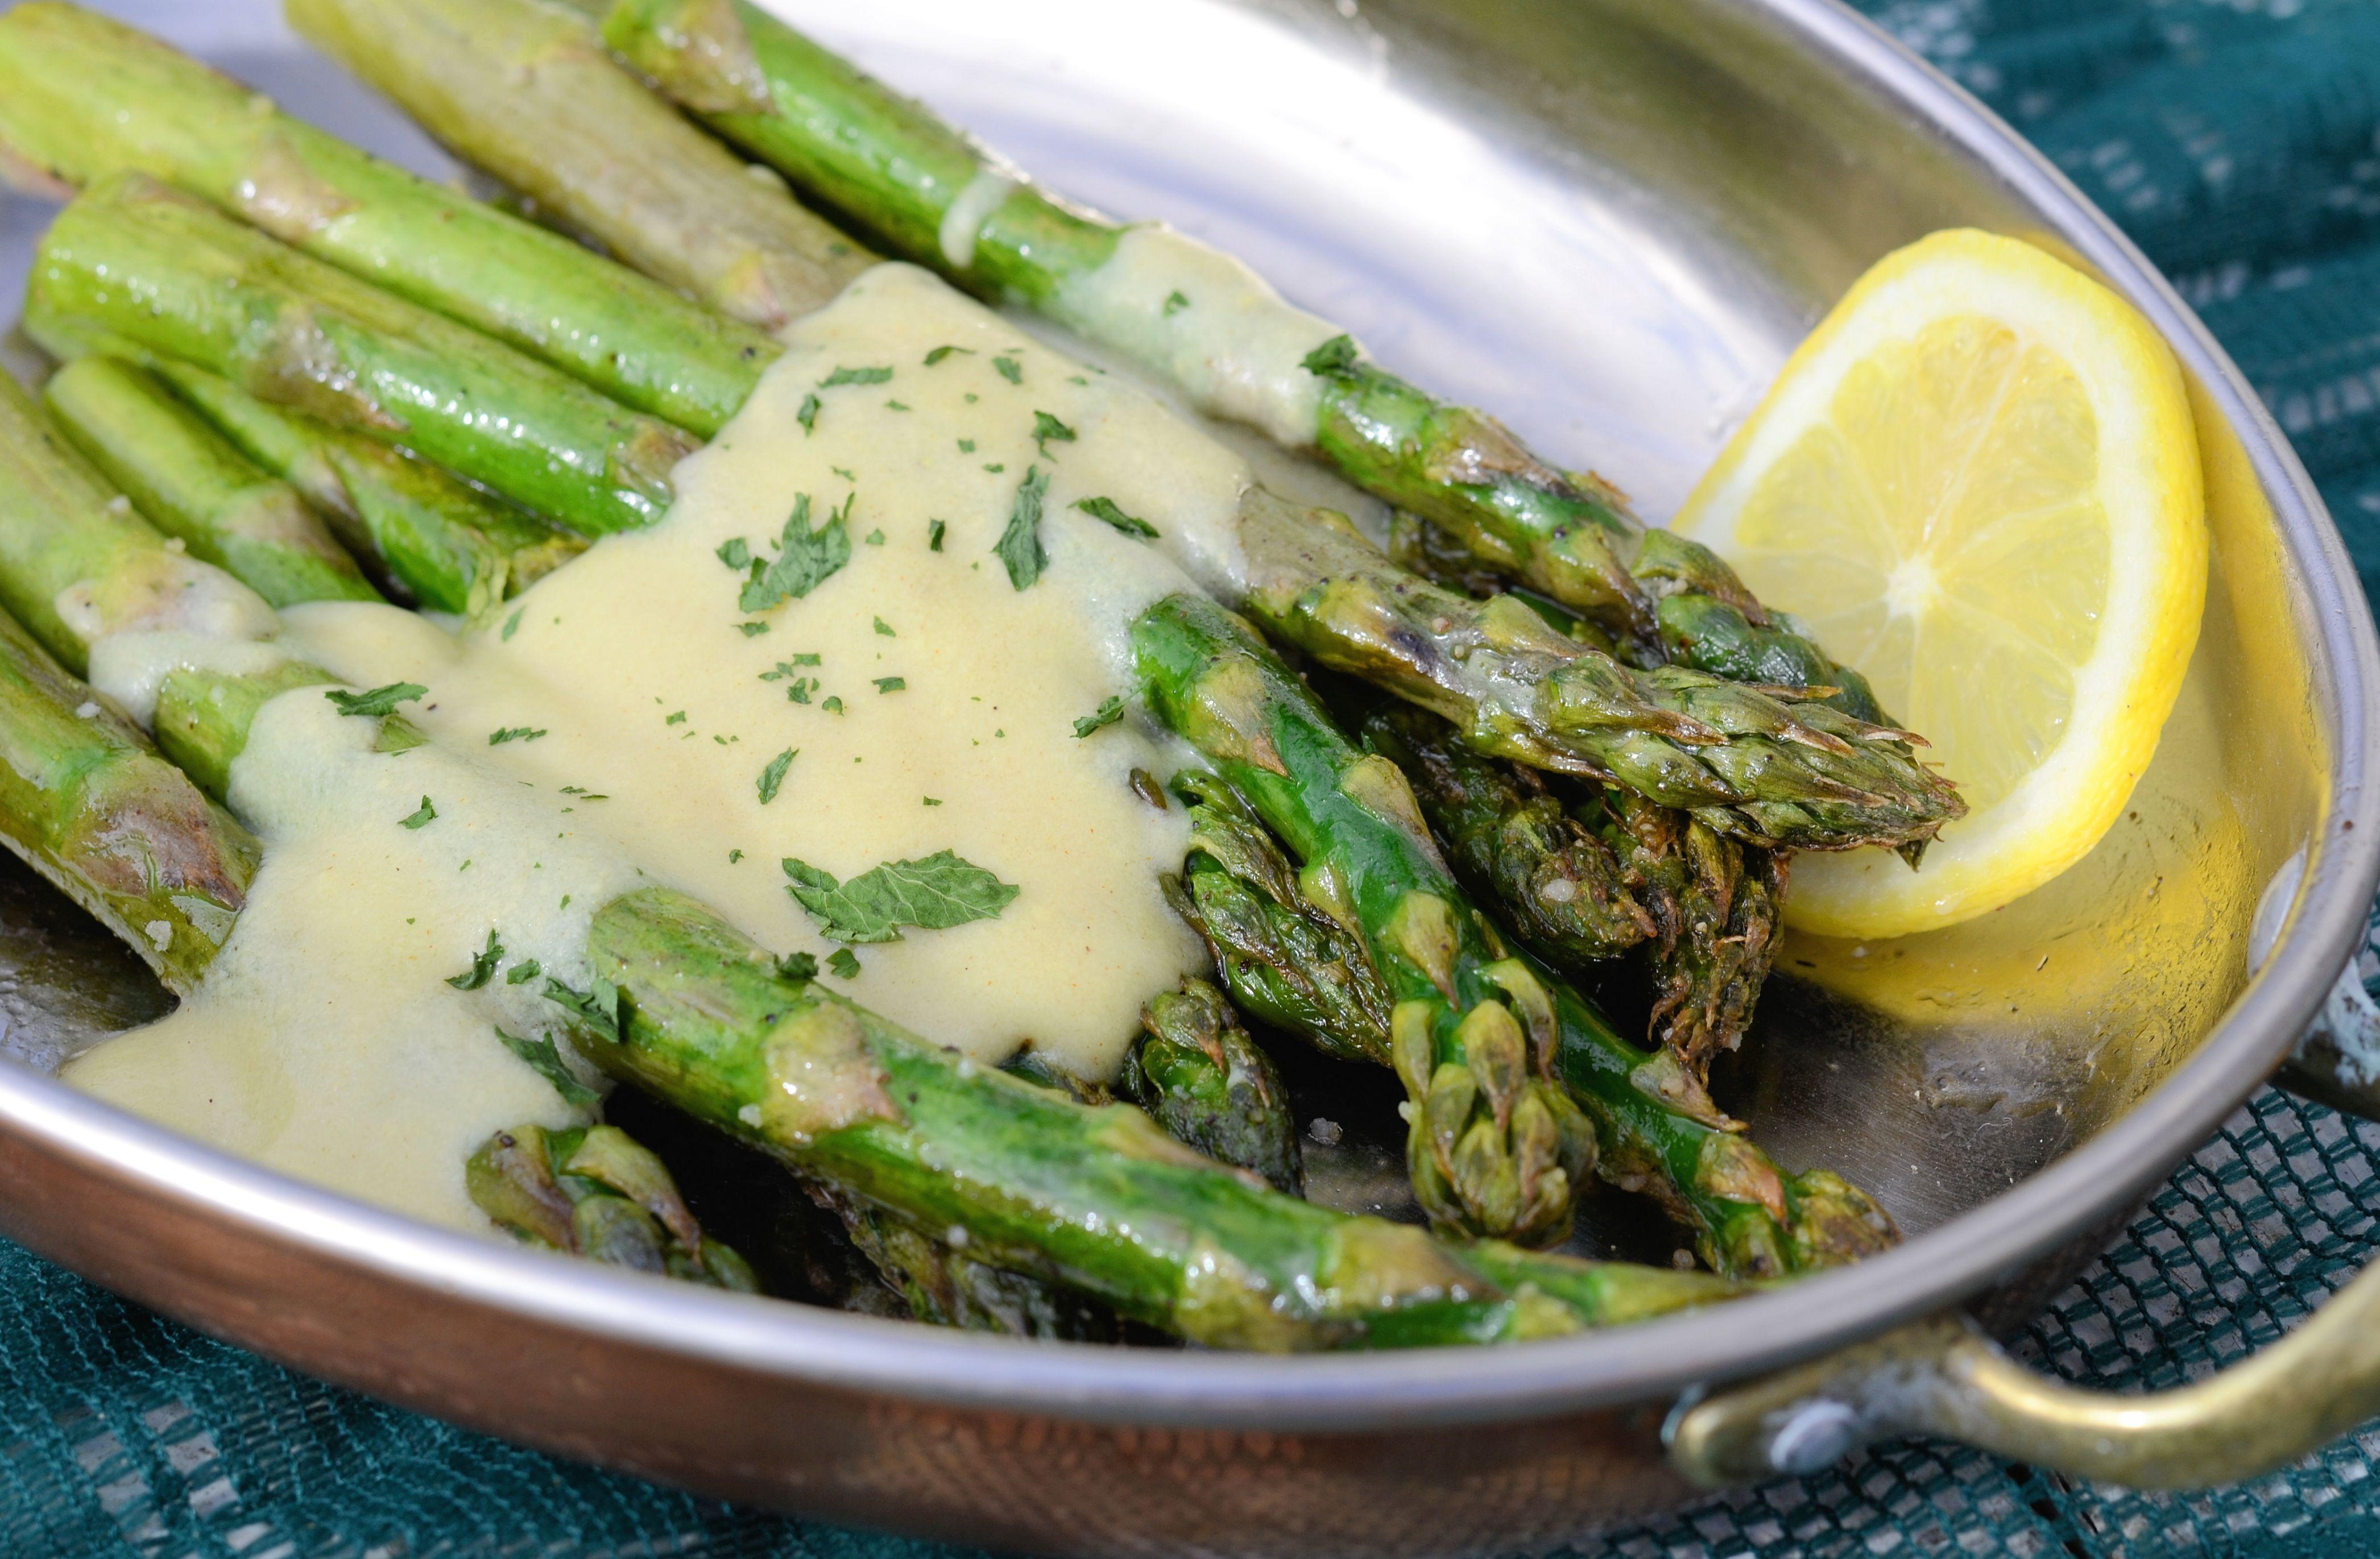 Sauce For Asparagus  Let it Bloom – Roasted Asparagus and Dijon Cream Sauce